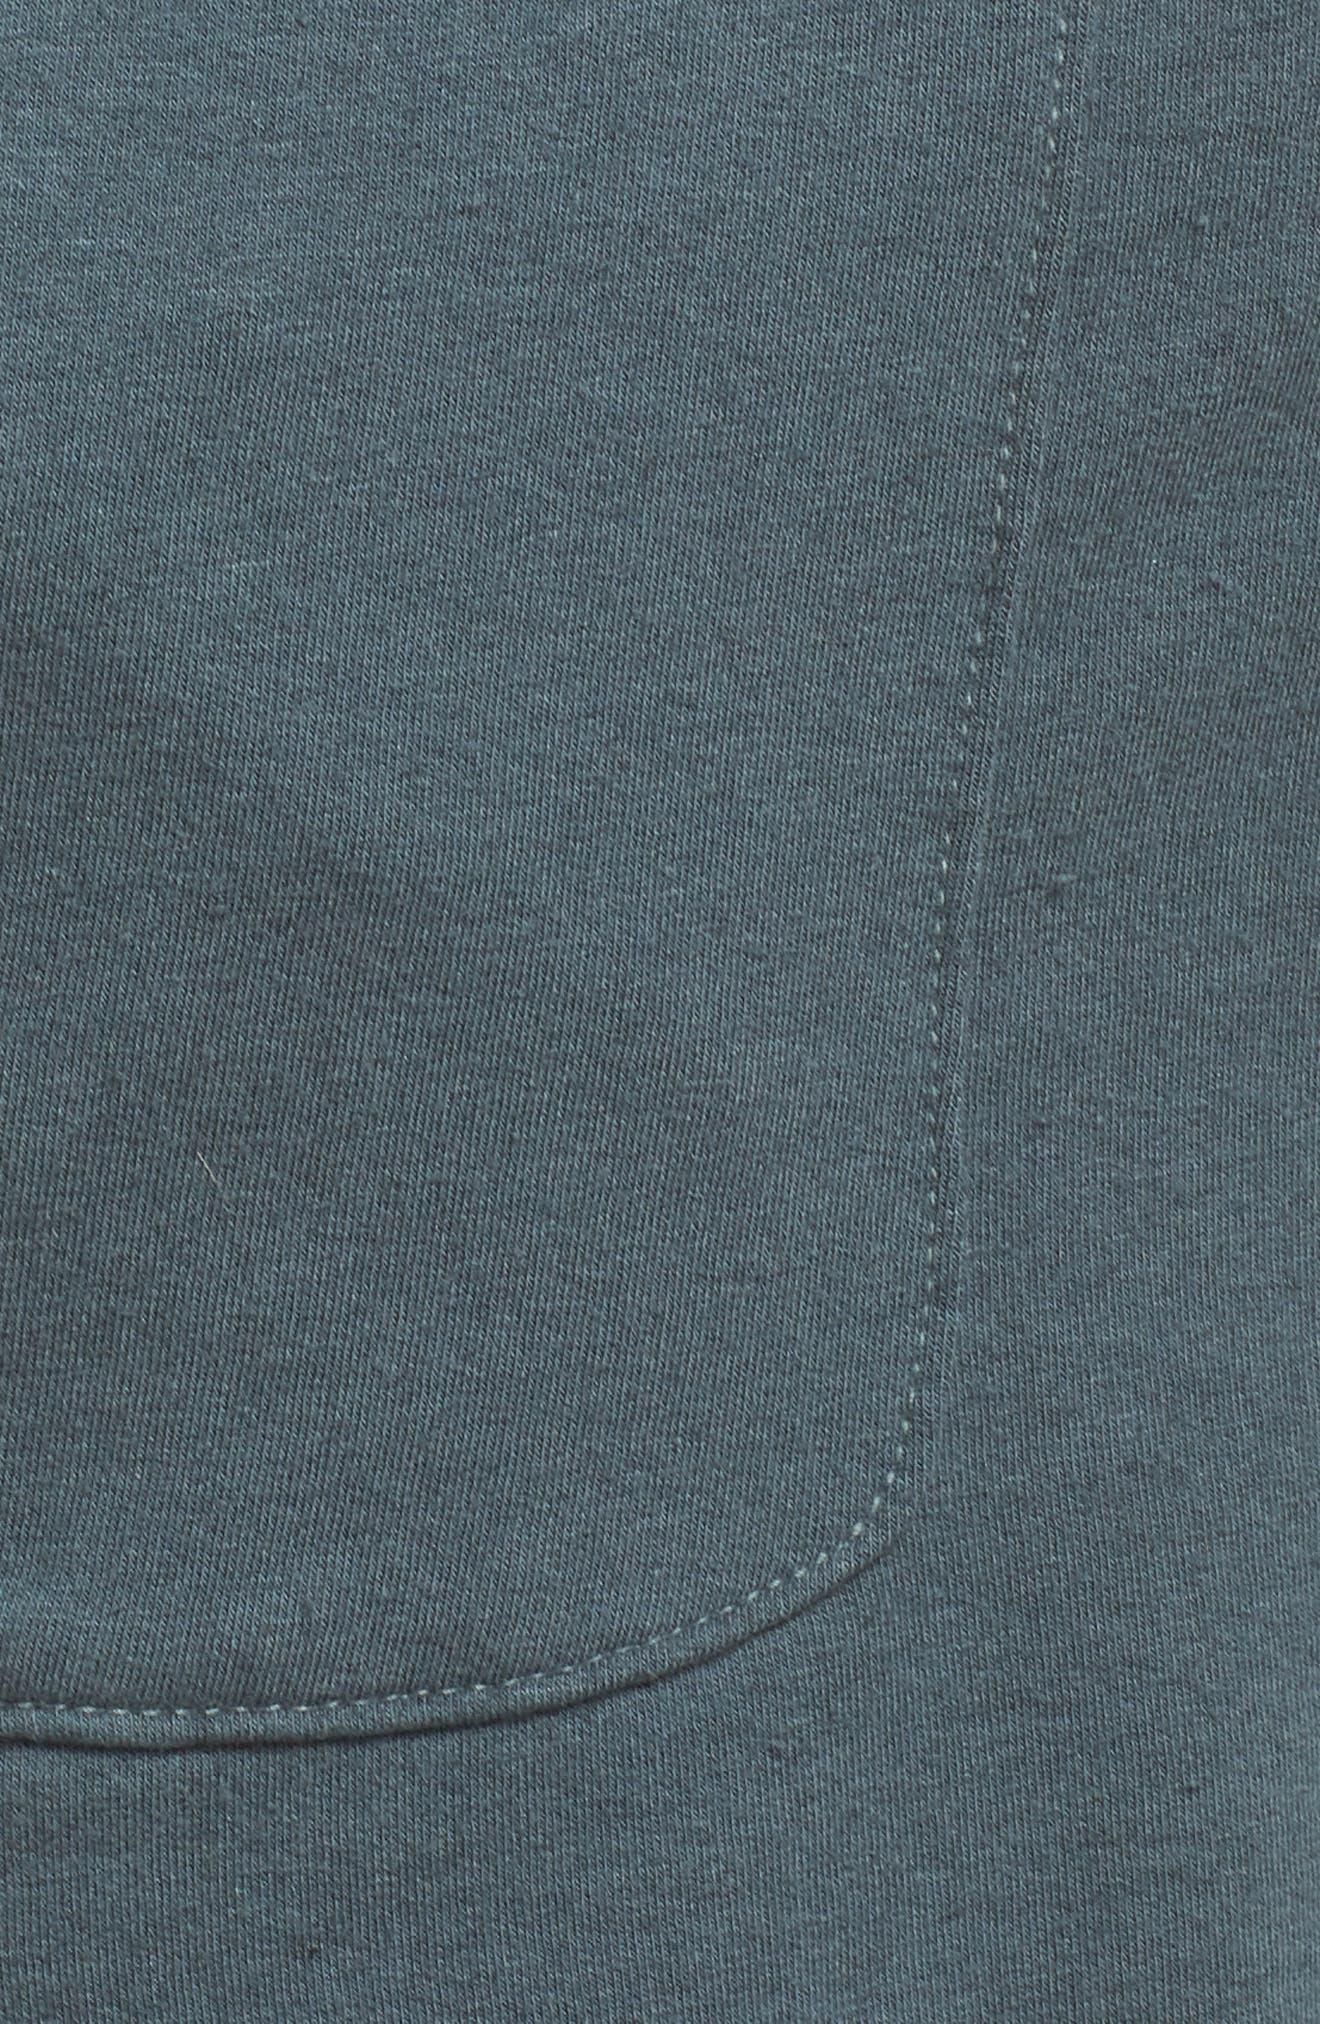 Raw Cut Lounge Shorts,                             Alternate thumbnail 6, color,                             Gunmetal